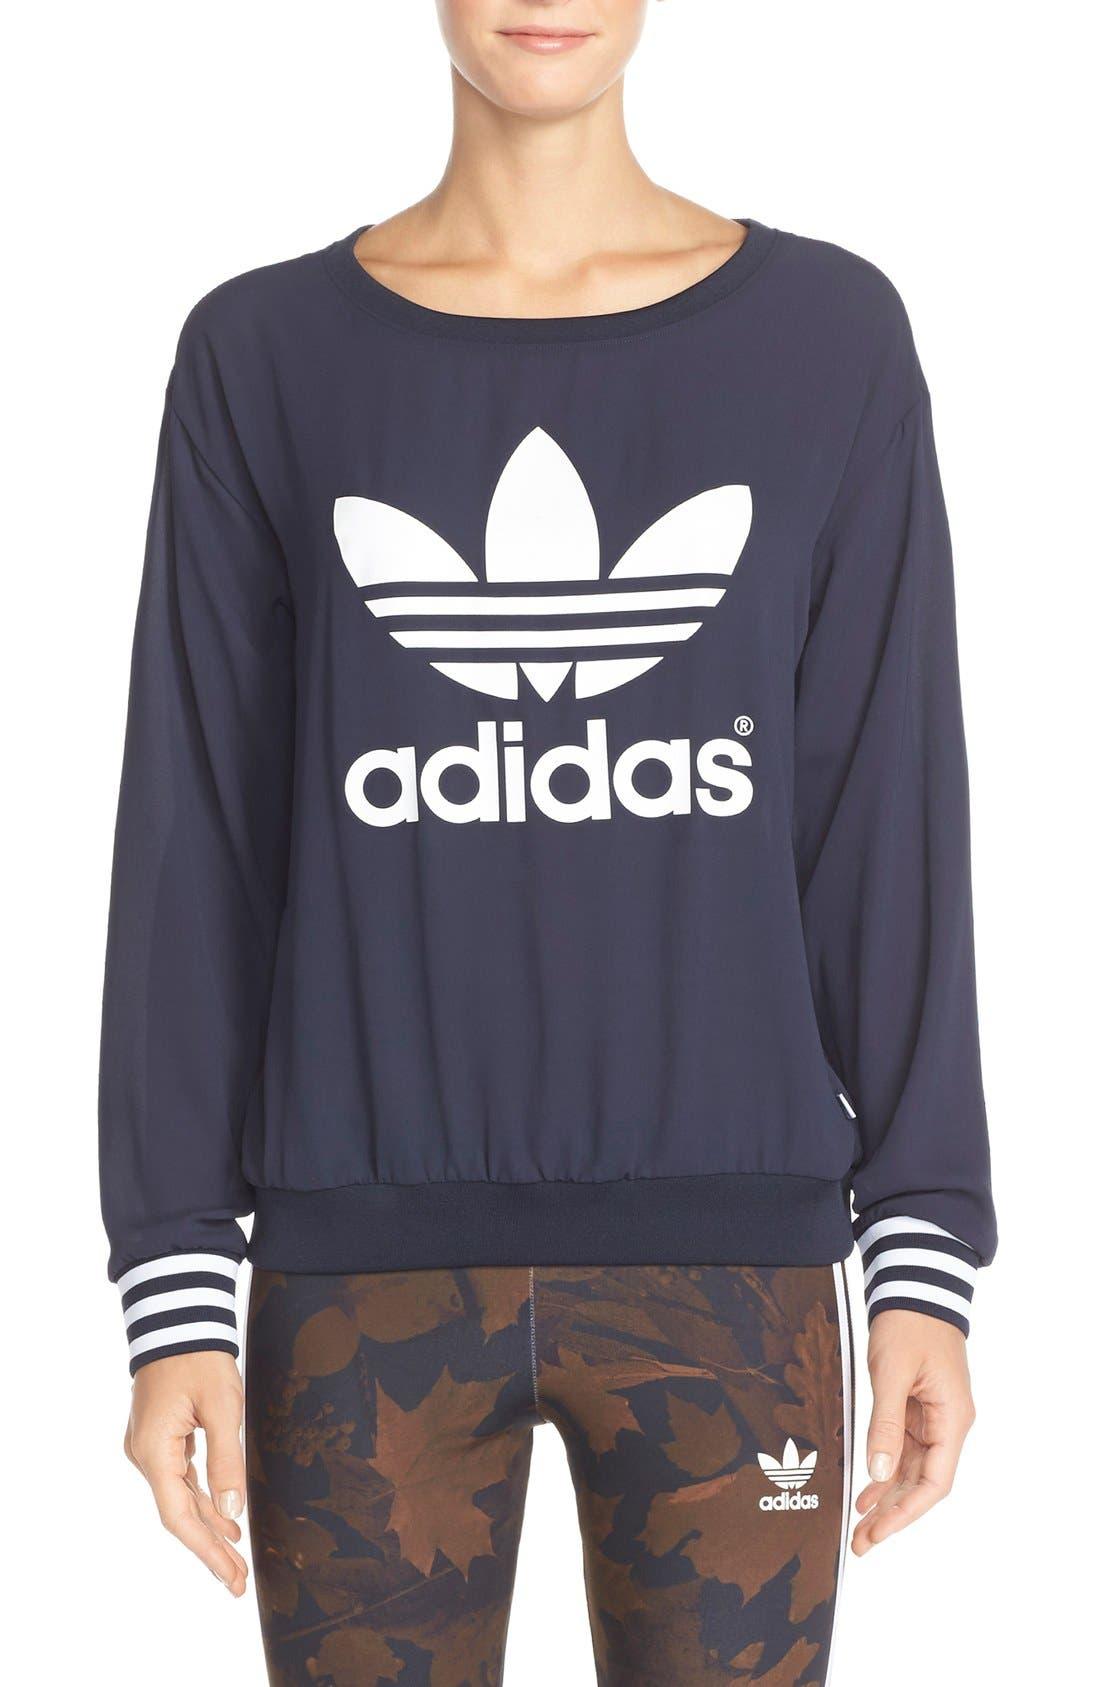 Main Image - adidas Originals Trefoil Crewneck Sweatshirt